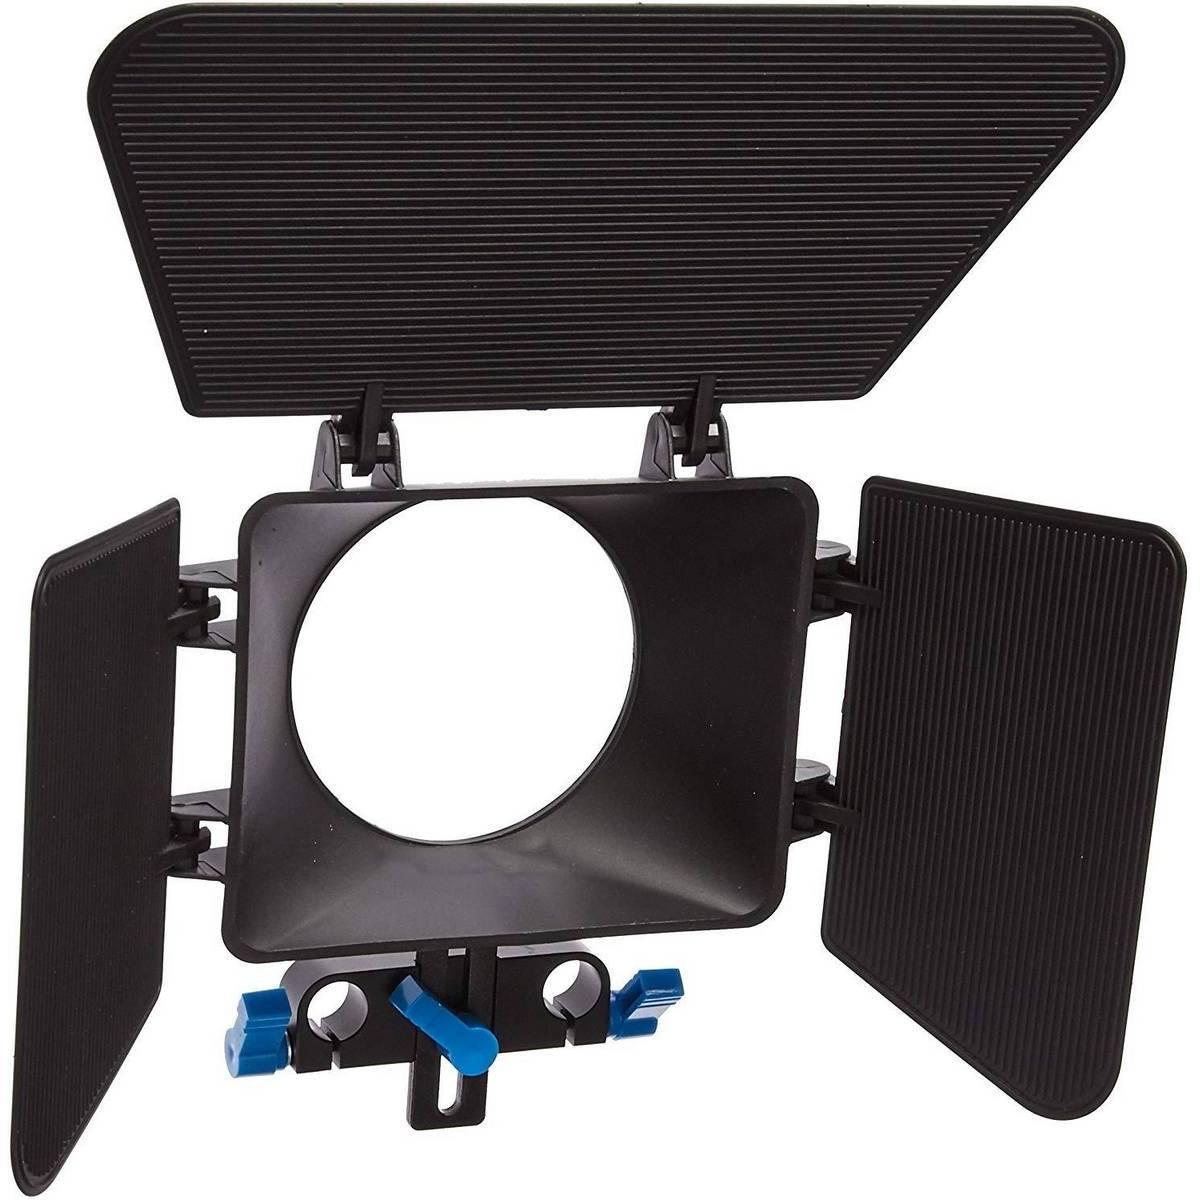 Digital Matte Box M1 15 mm Rail Rod Support M1 for DSLR Camera